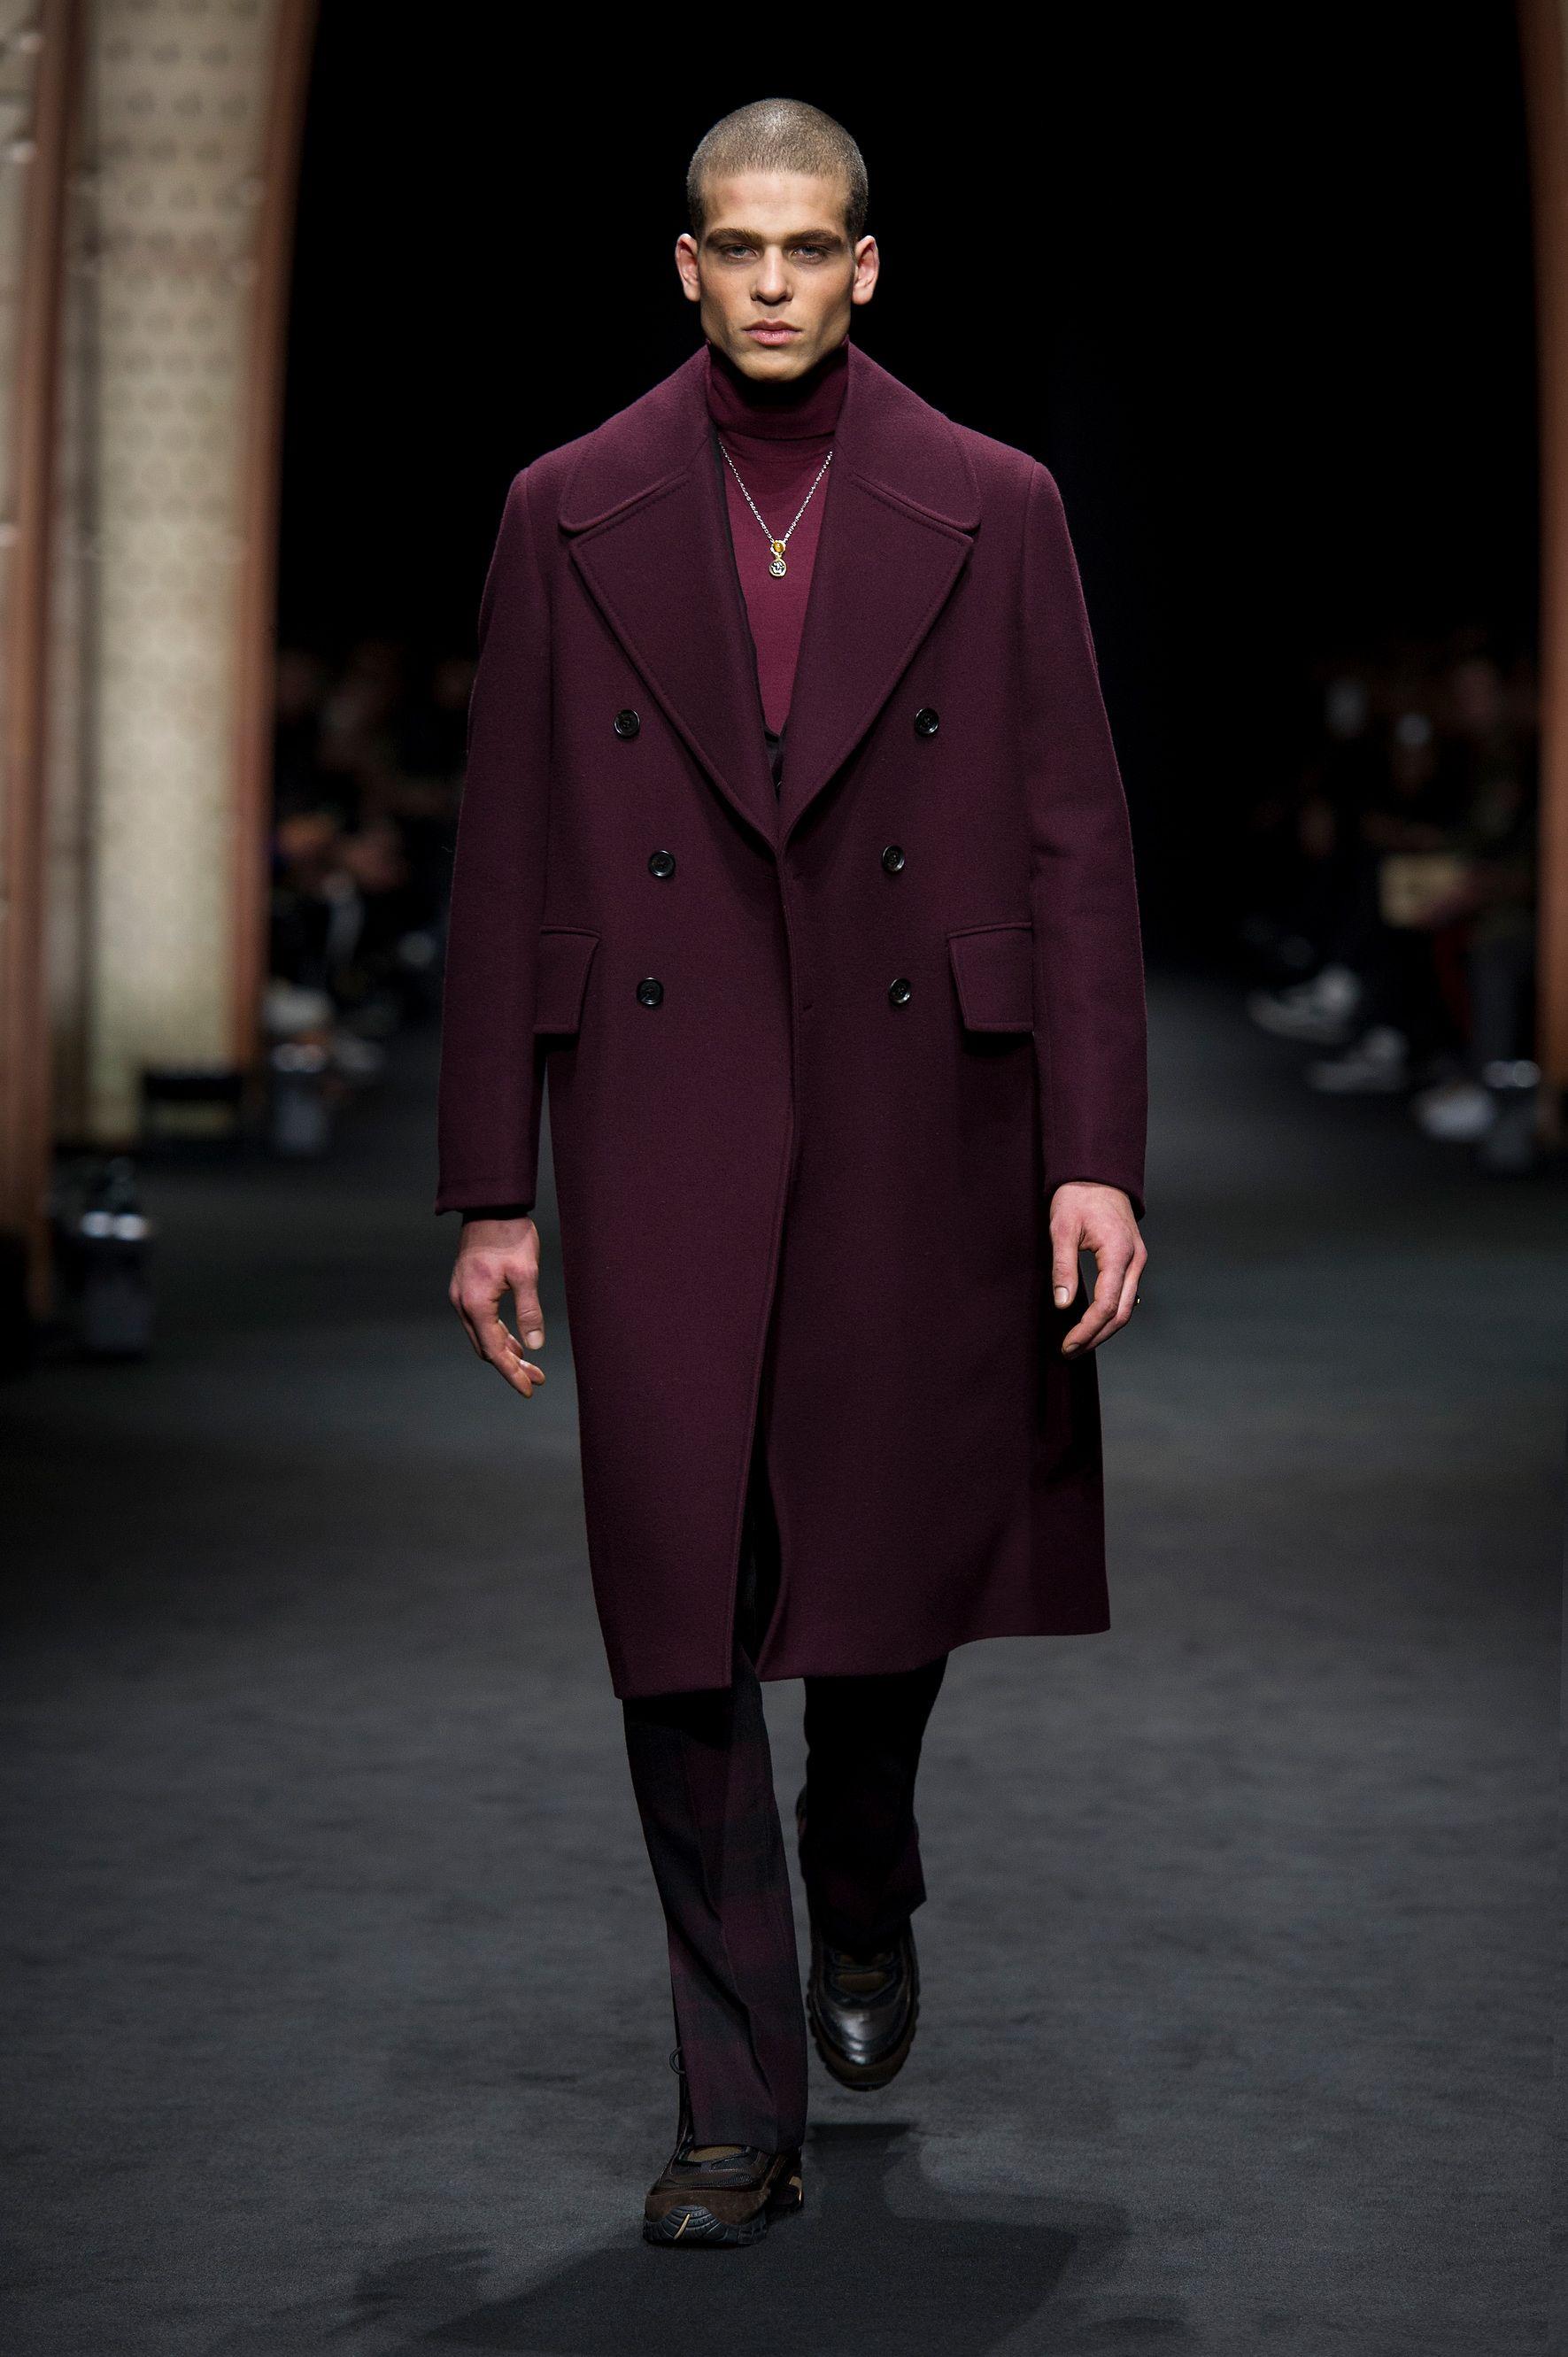 look 4 versace men 39 s fall winter 2017 show versace menswear fall winter 2017 pinterest. Black Bedroom Furniture Sets. Home Design Ideas